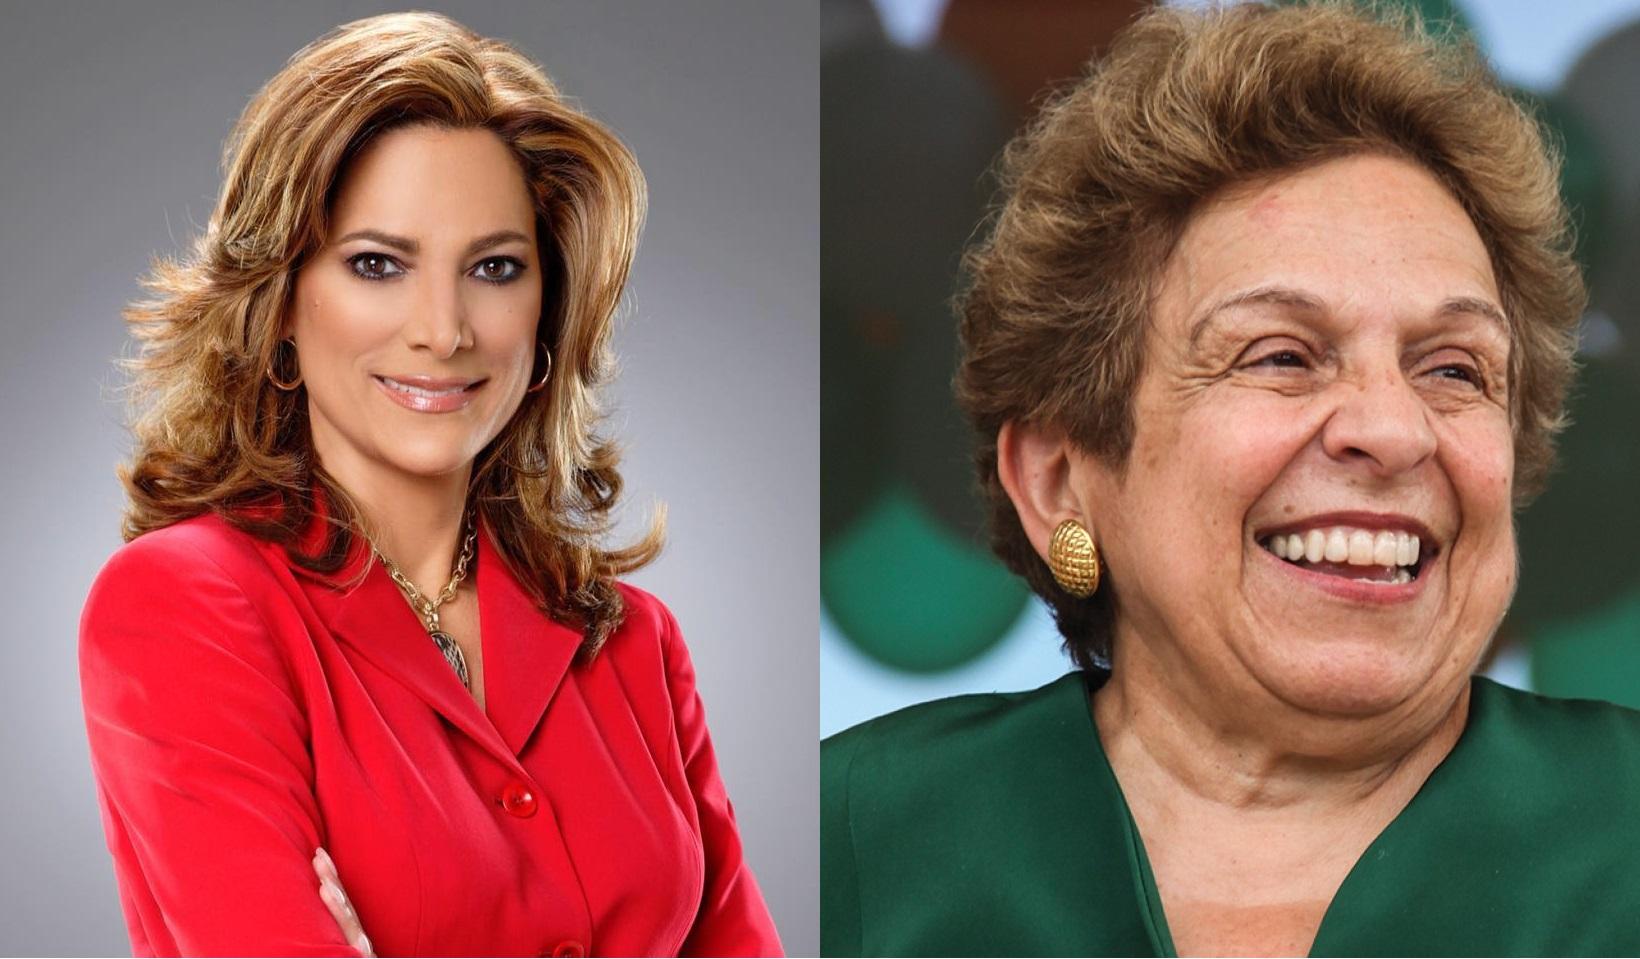 Maria-Elvira-Salazar-Donna-Shalala.jpg